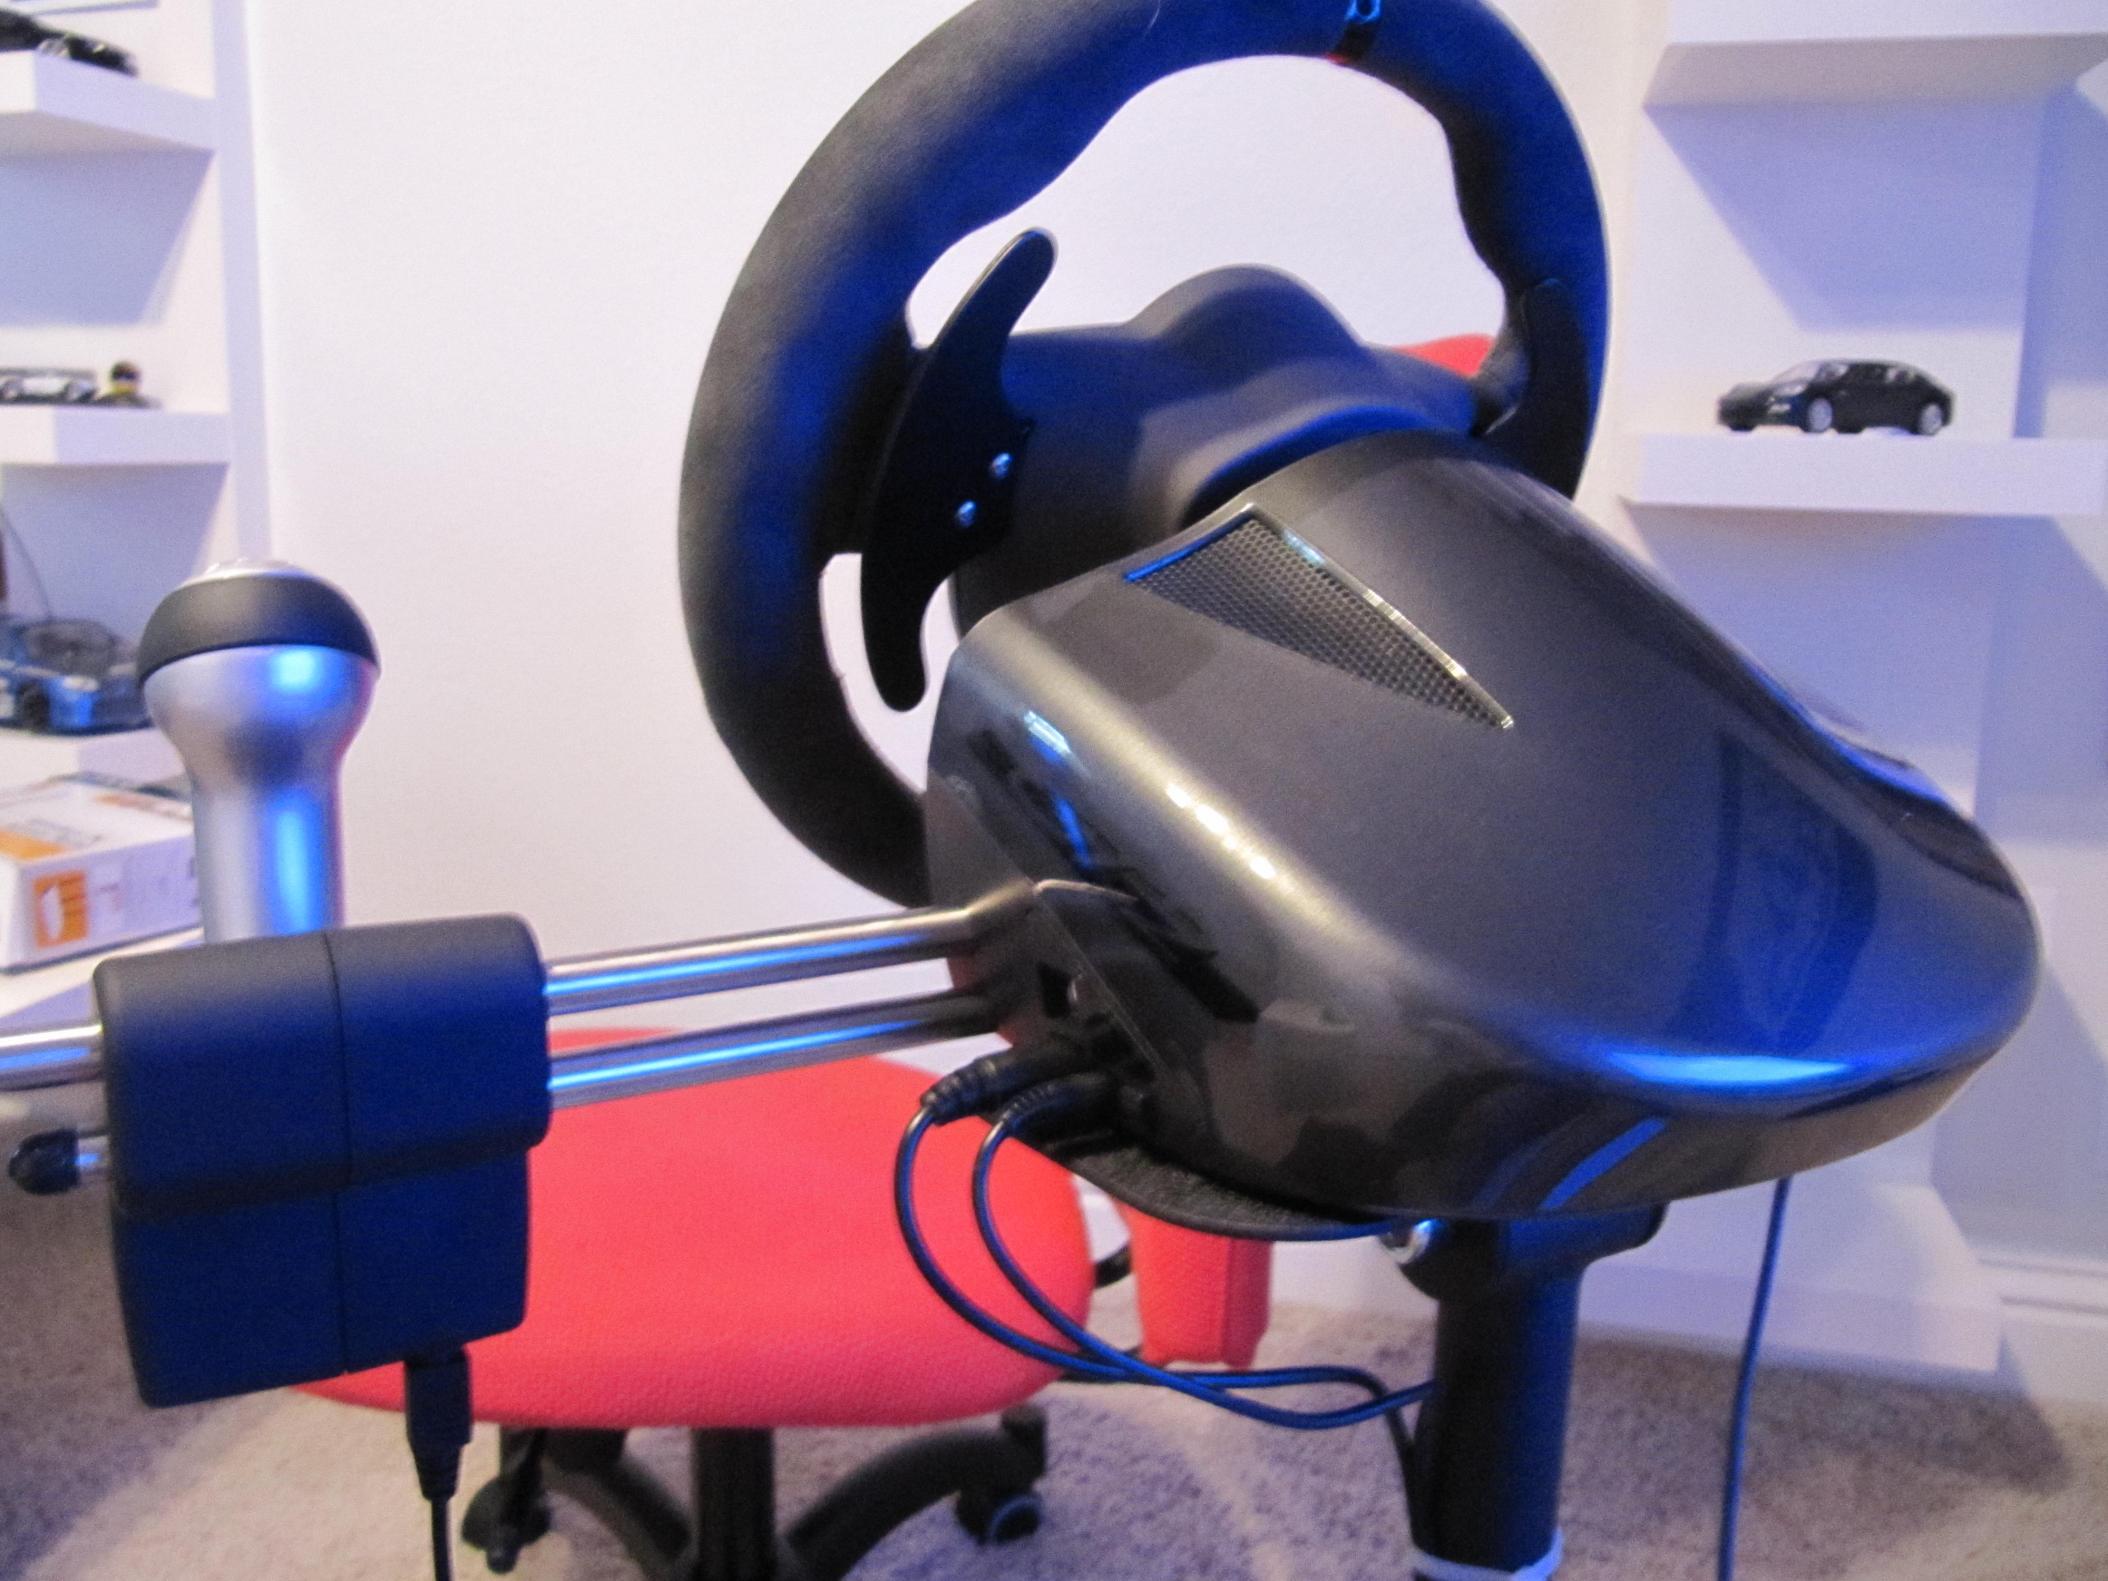 fanatec porsche 911 gt2 wheel for sale. Black Bedroom Furniture Sets. Home Design Ideas